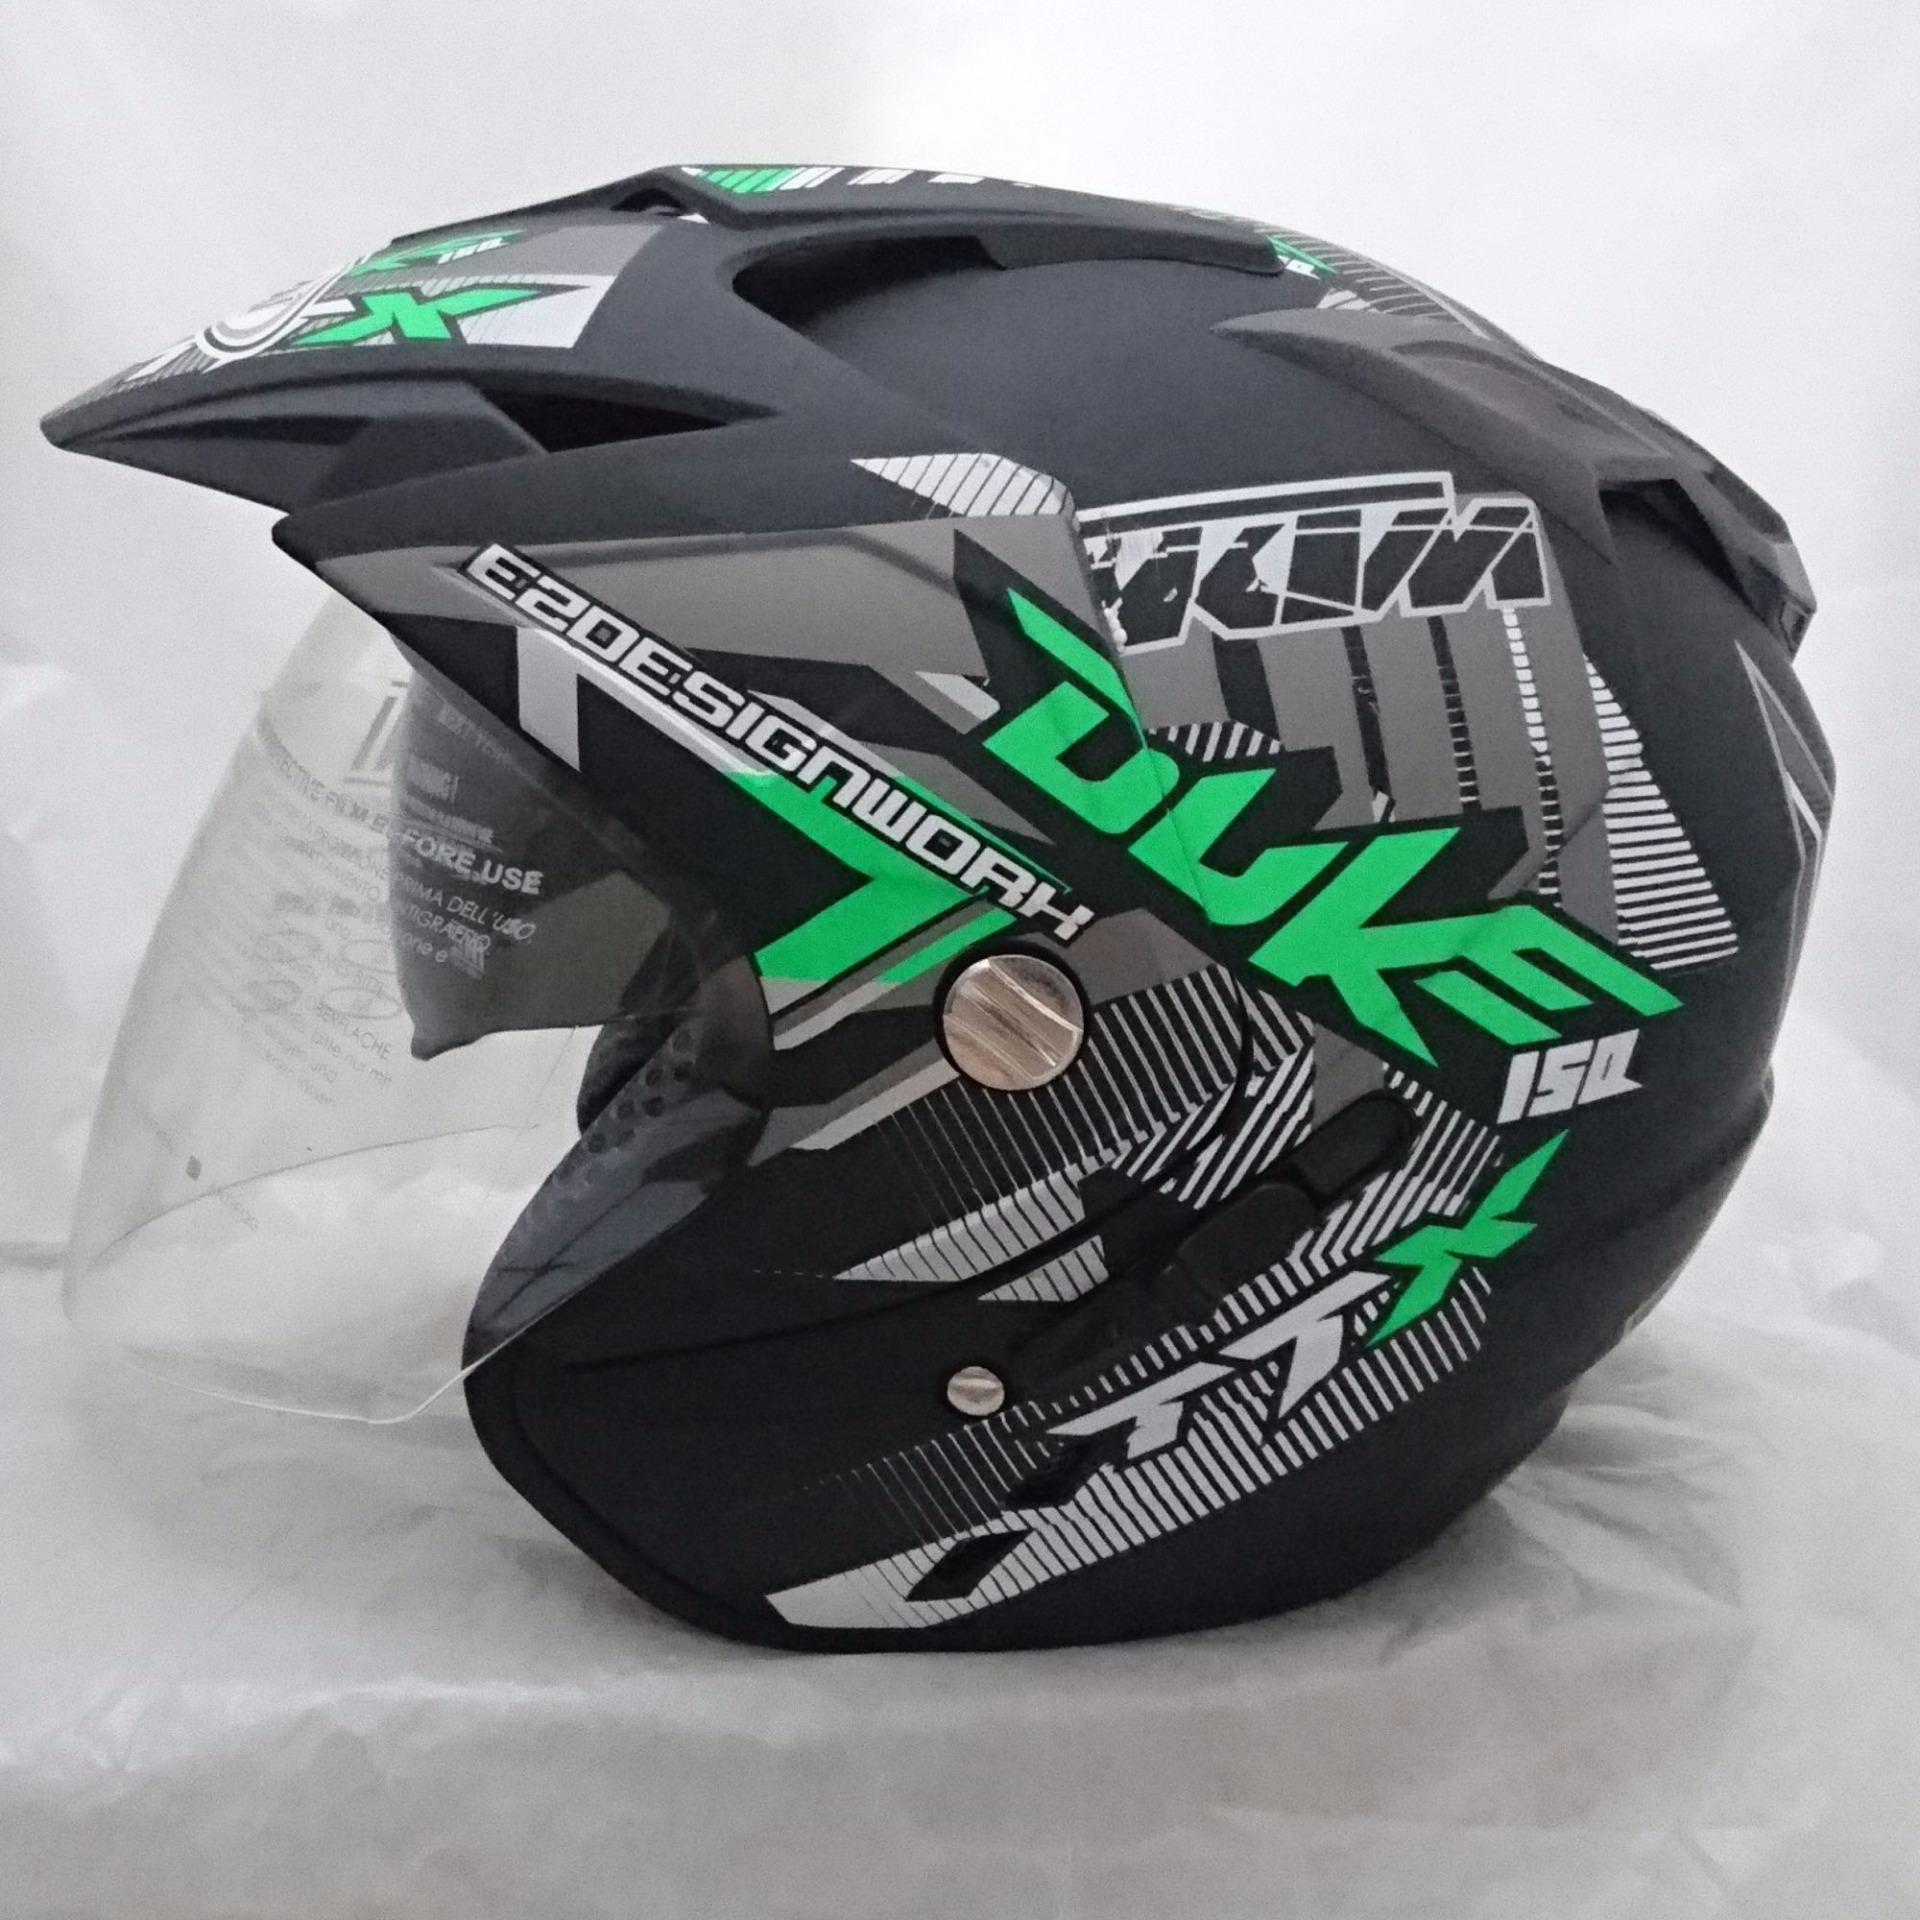 Jual Helm Dmn 2 Kaca Double Visor Duke Black Doff Green Cam Original